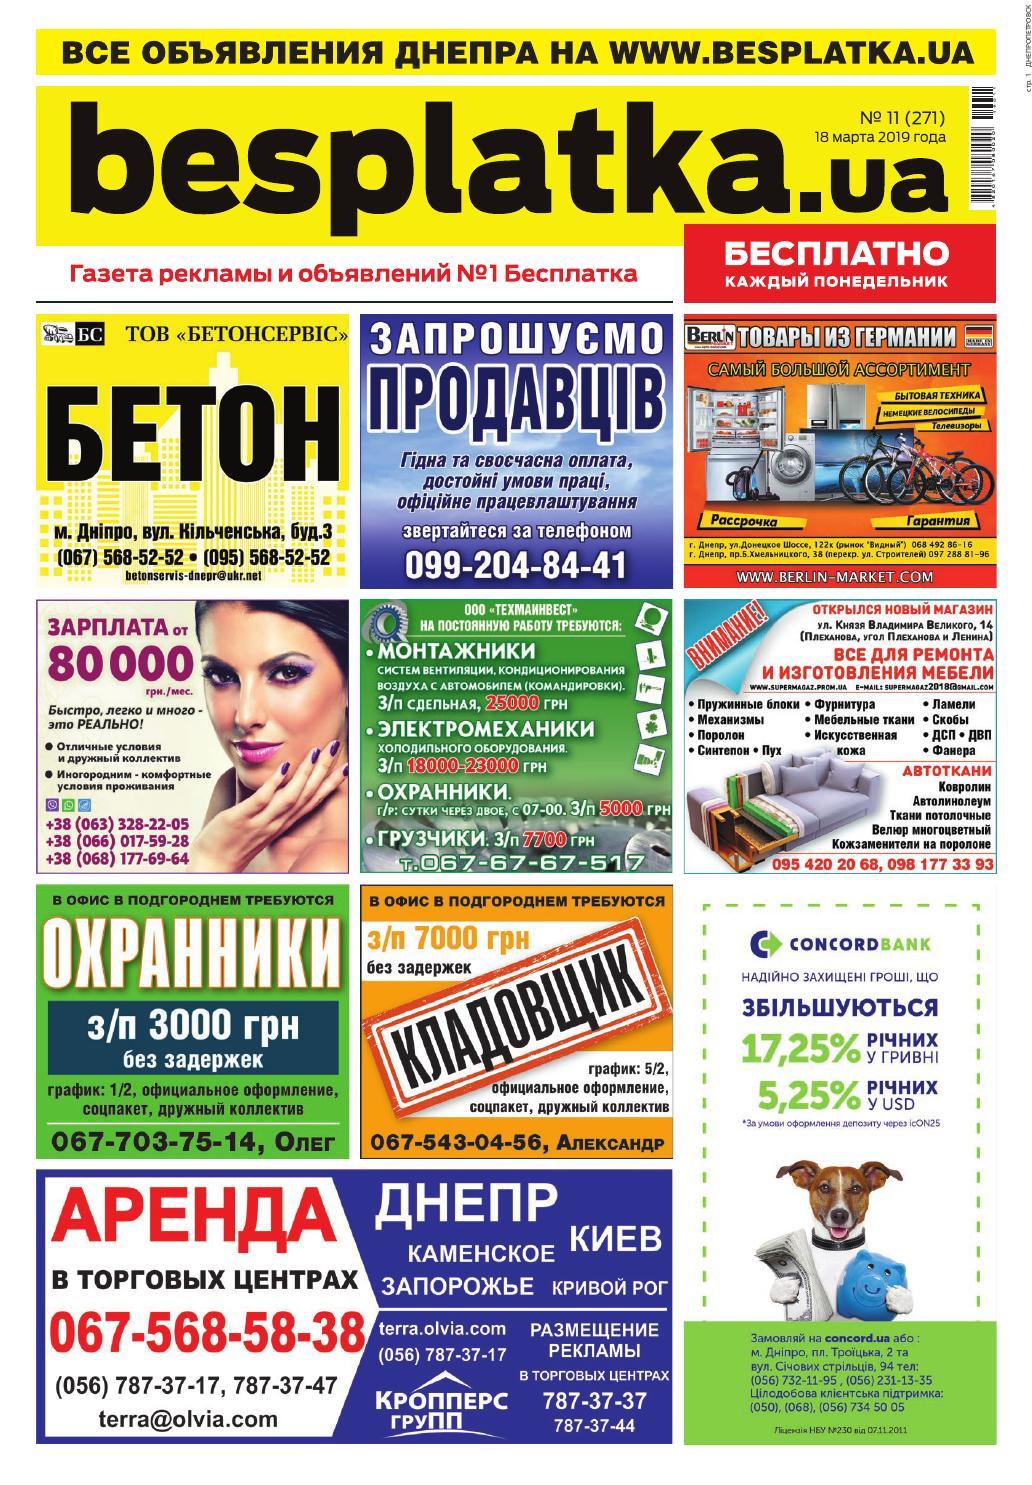 cef28e30037cd Besplatka #11 Днепр by besplatka ukraine - issuu